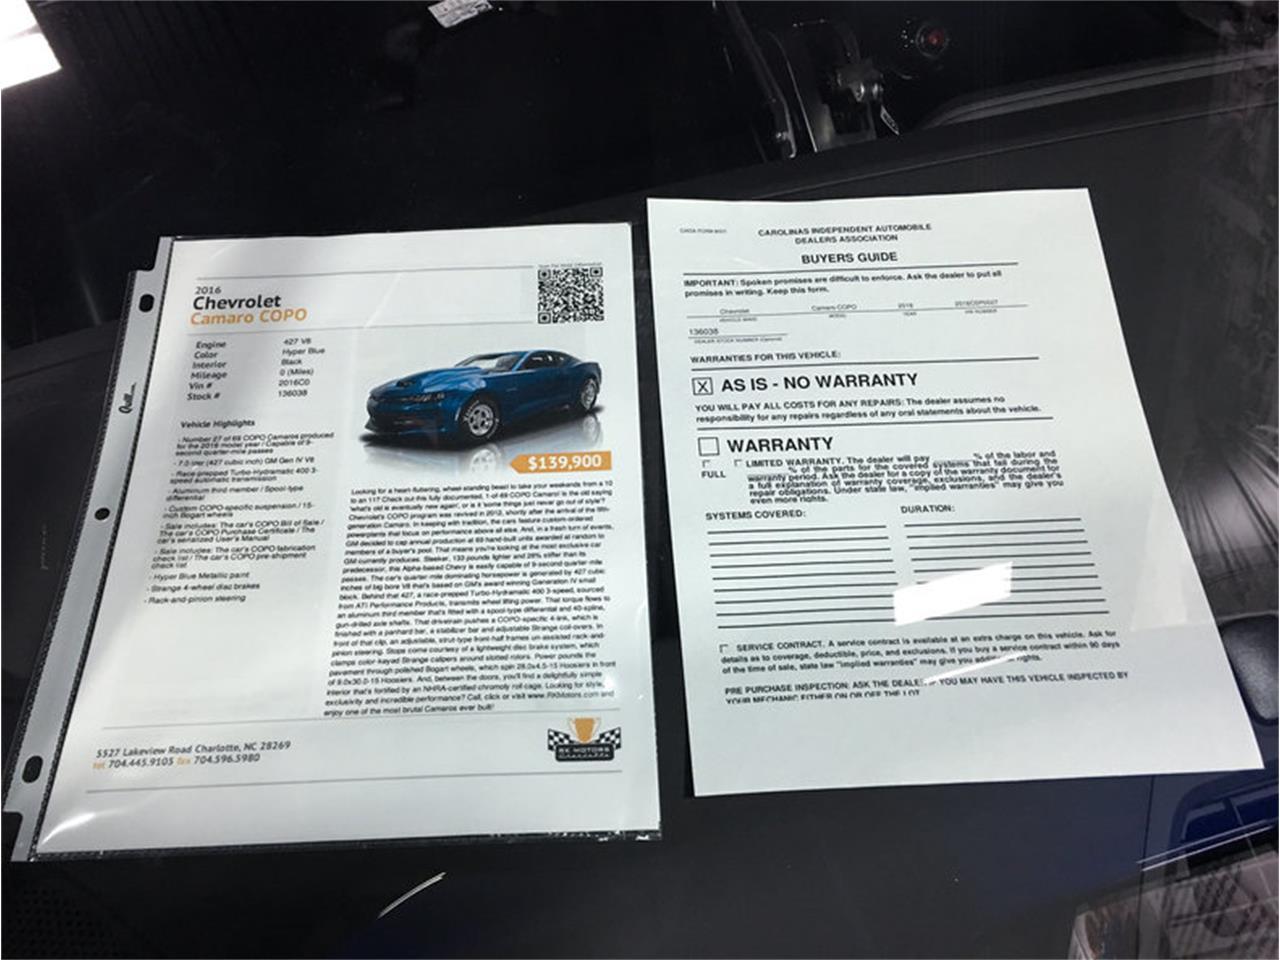 Large Picture of 2016 Chevrolet Camaro COPO - $139,900.00 - MFAR